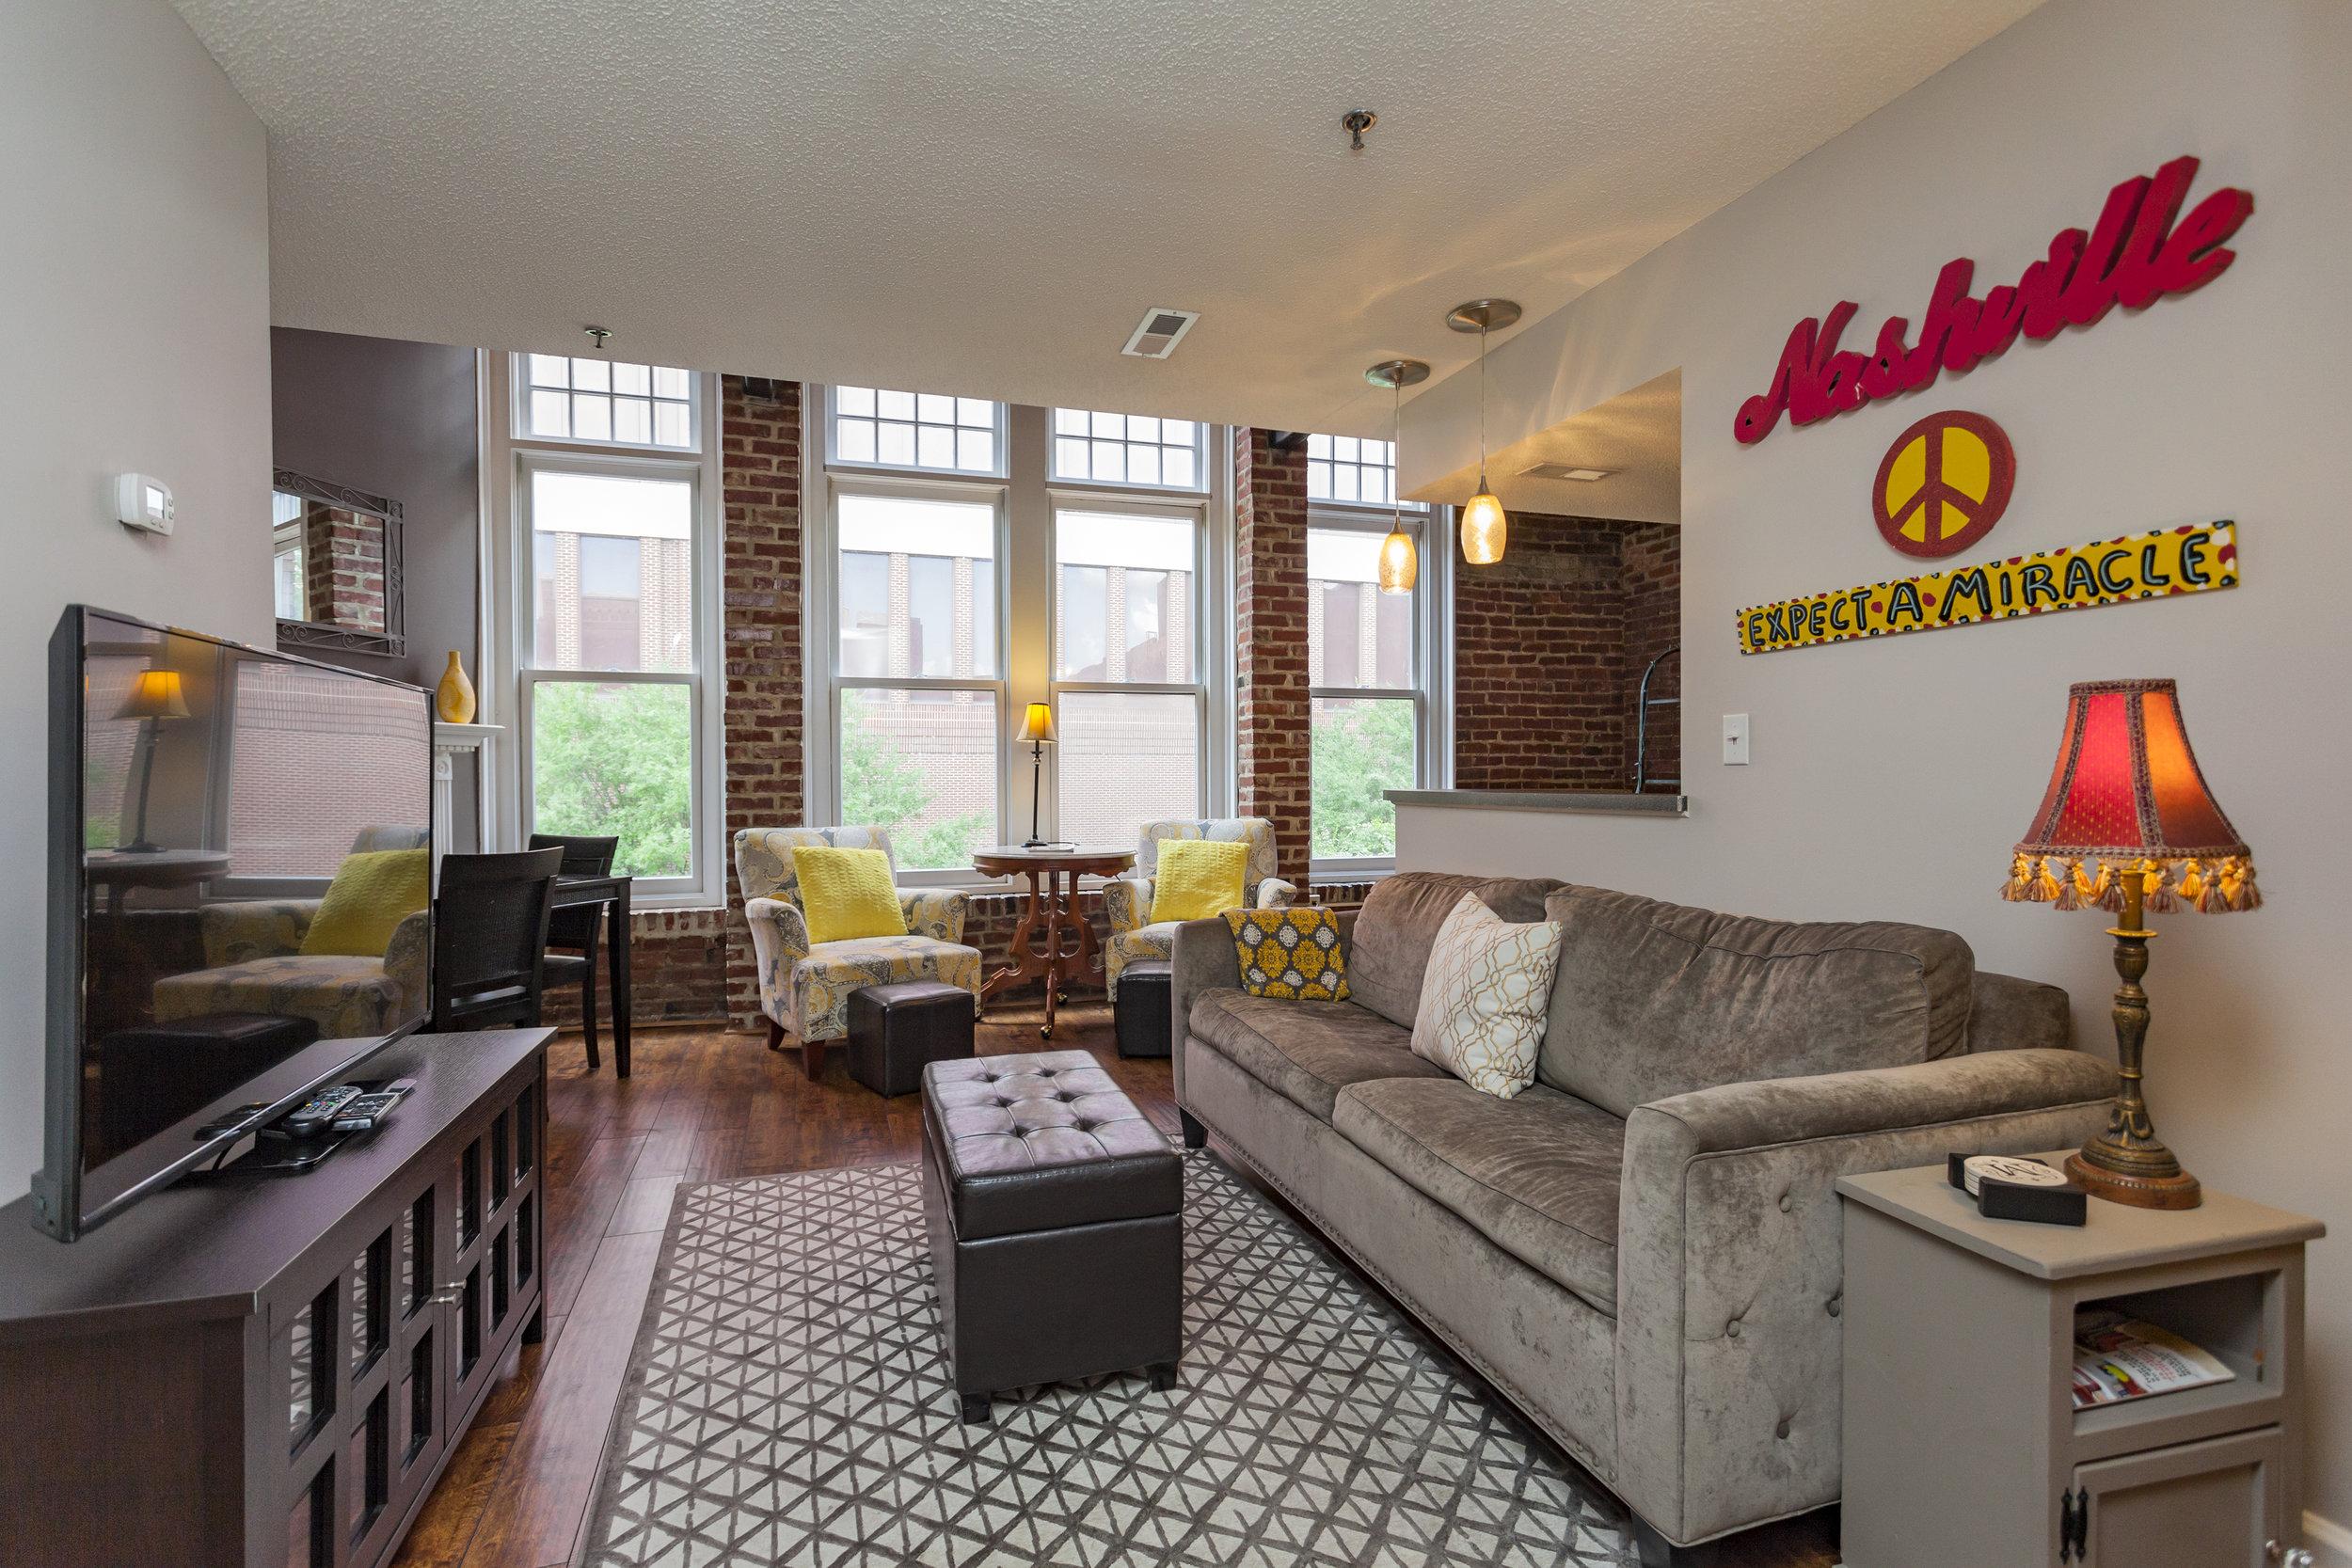 Rent apartment in Nashville